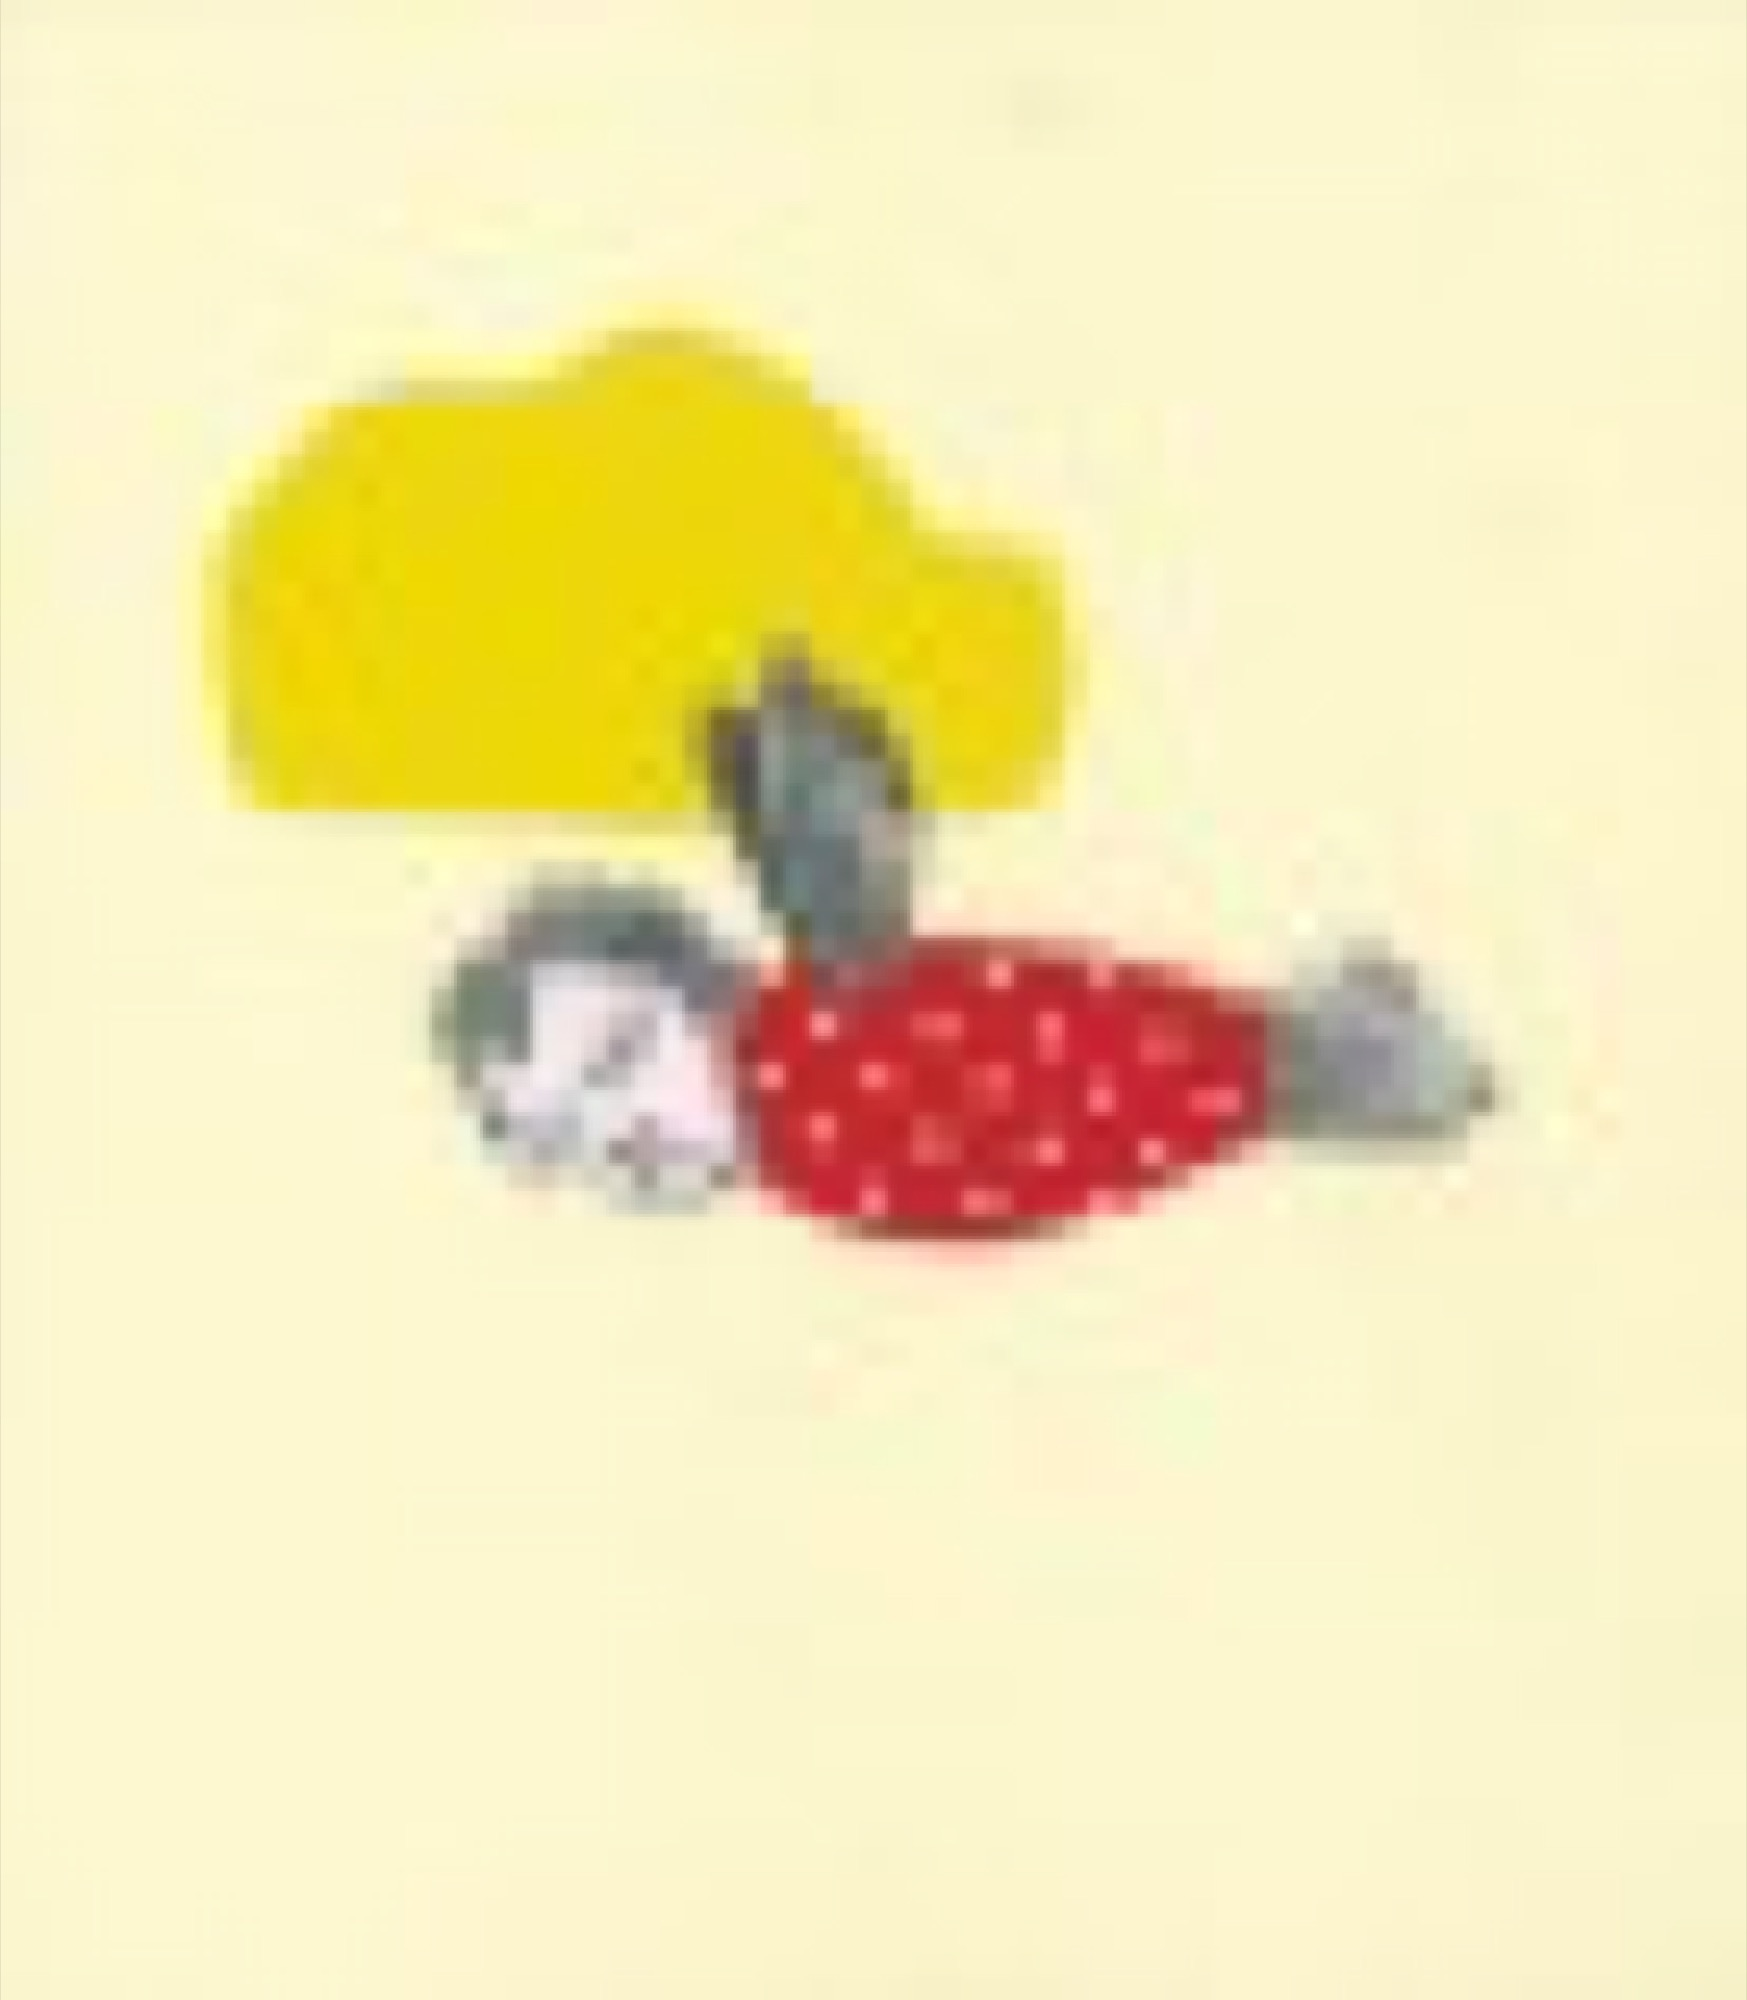 Valle, mormor & vaniljsåsen, childrensbook 2003.